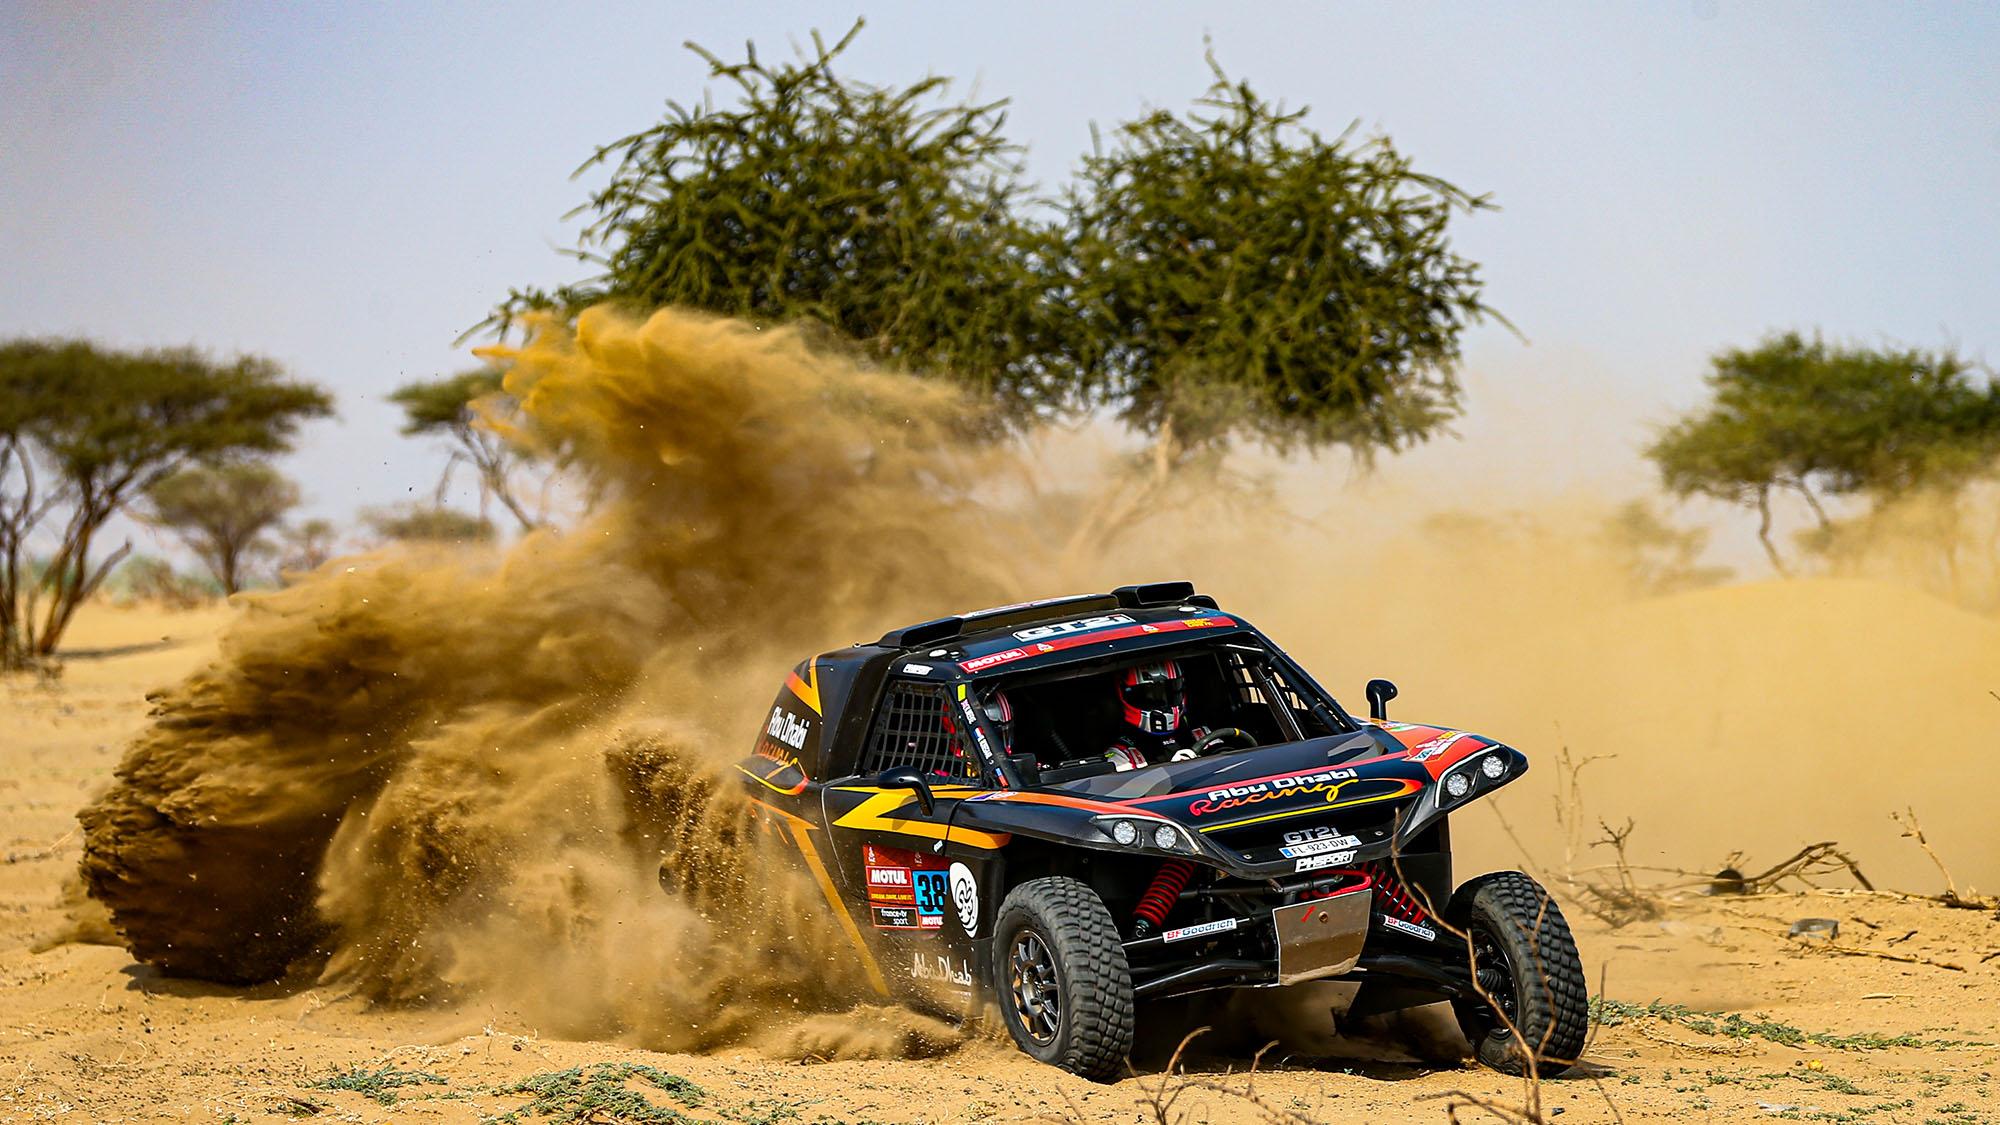 # 380 Meeke Kris (gbr), Rosegaar Wouter (nld), PH Sport, PH Sport, Light Weight Vehicles Protoype - T3, action during the shakedown of the Dakar 2021 in Jeddah, Saudi Arabia on December 31, 2021